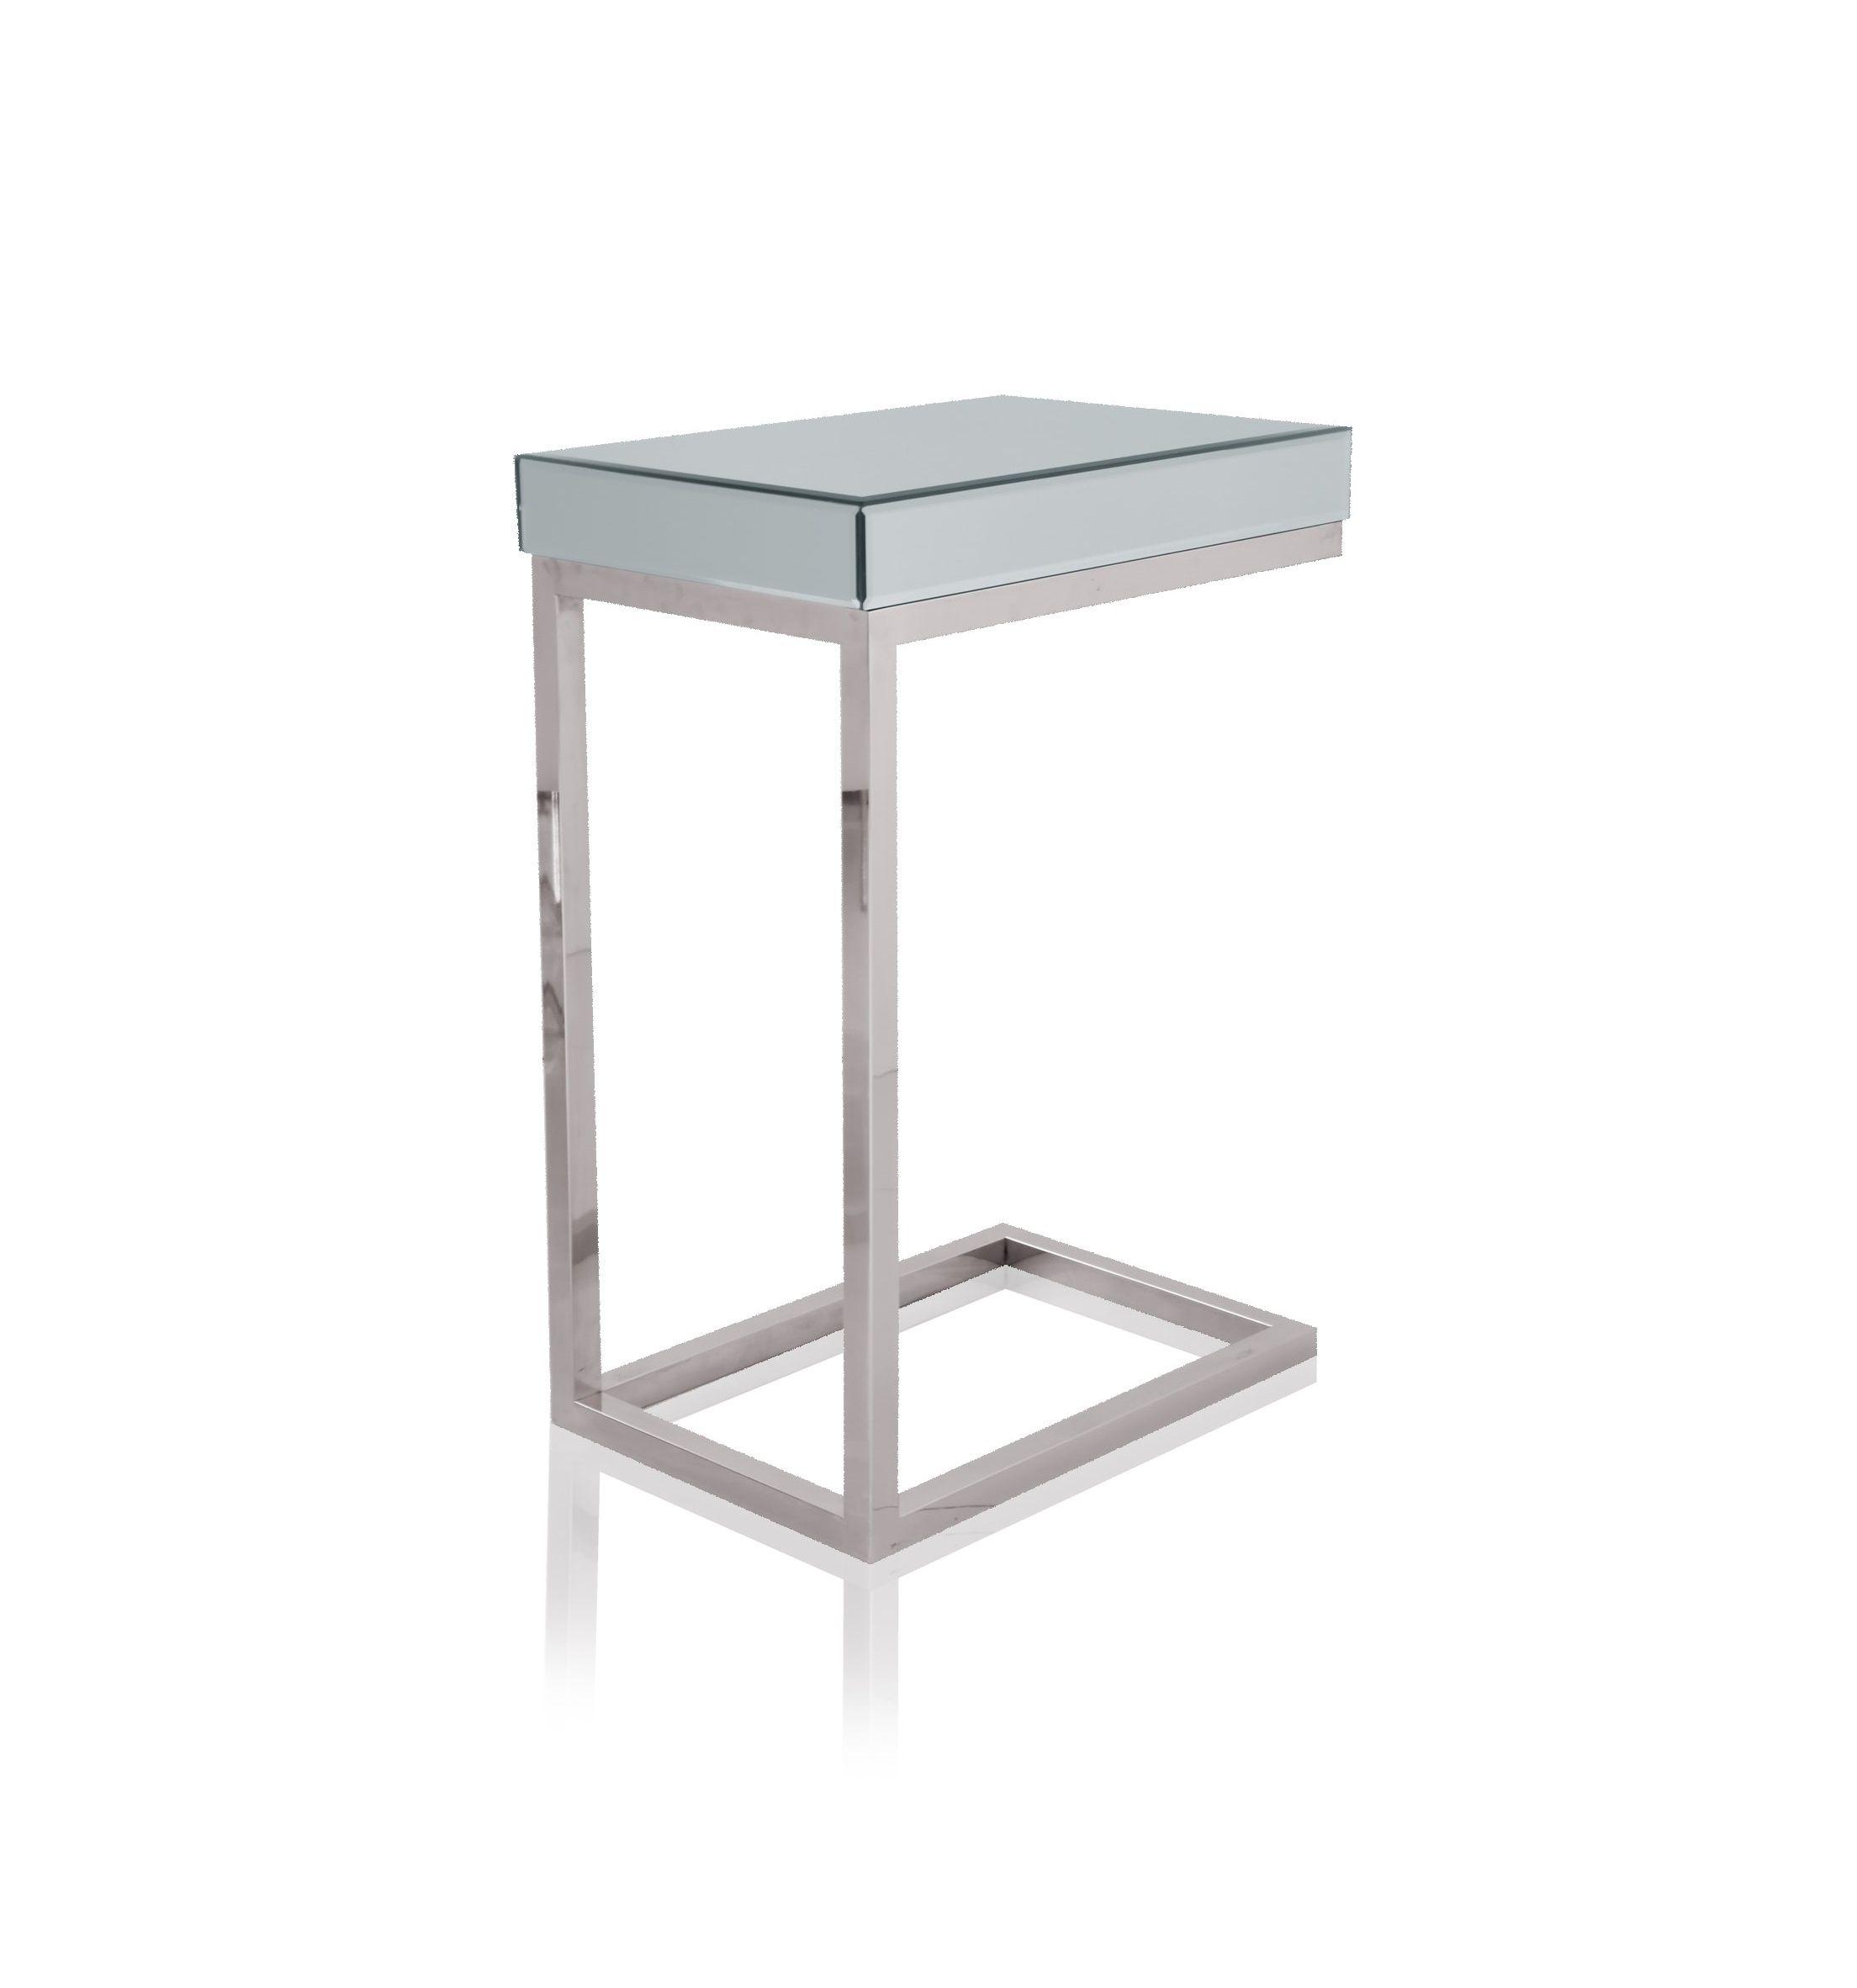 Ilda Glass Modern Side Table Furniture Glass Modern Side Table Modern Side Table Side Table [ 2364 x 2208 Pixel ]